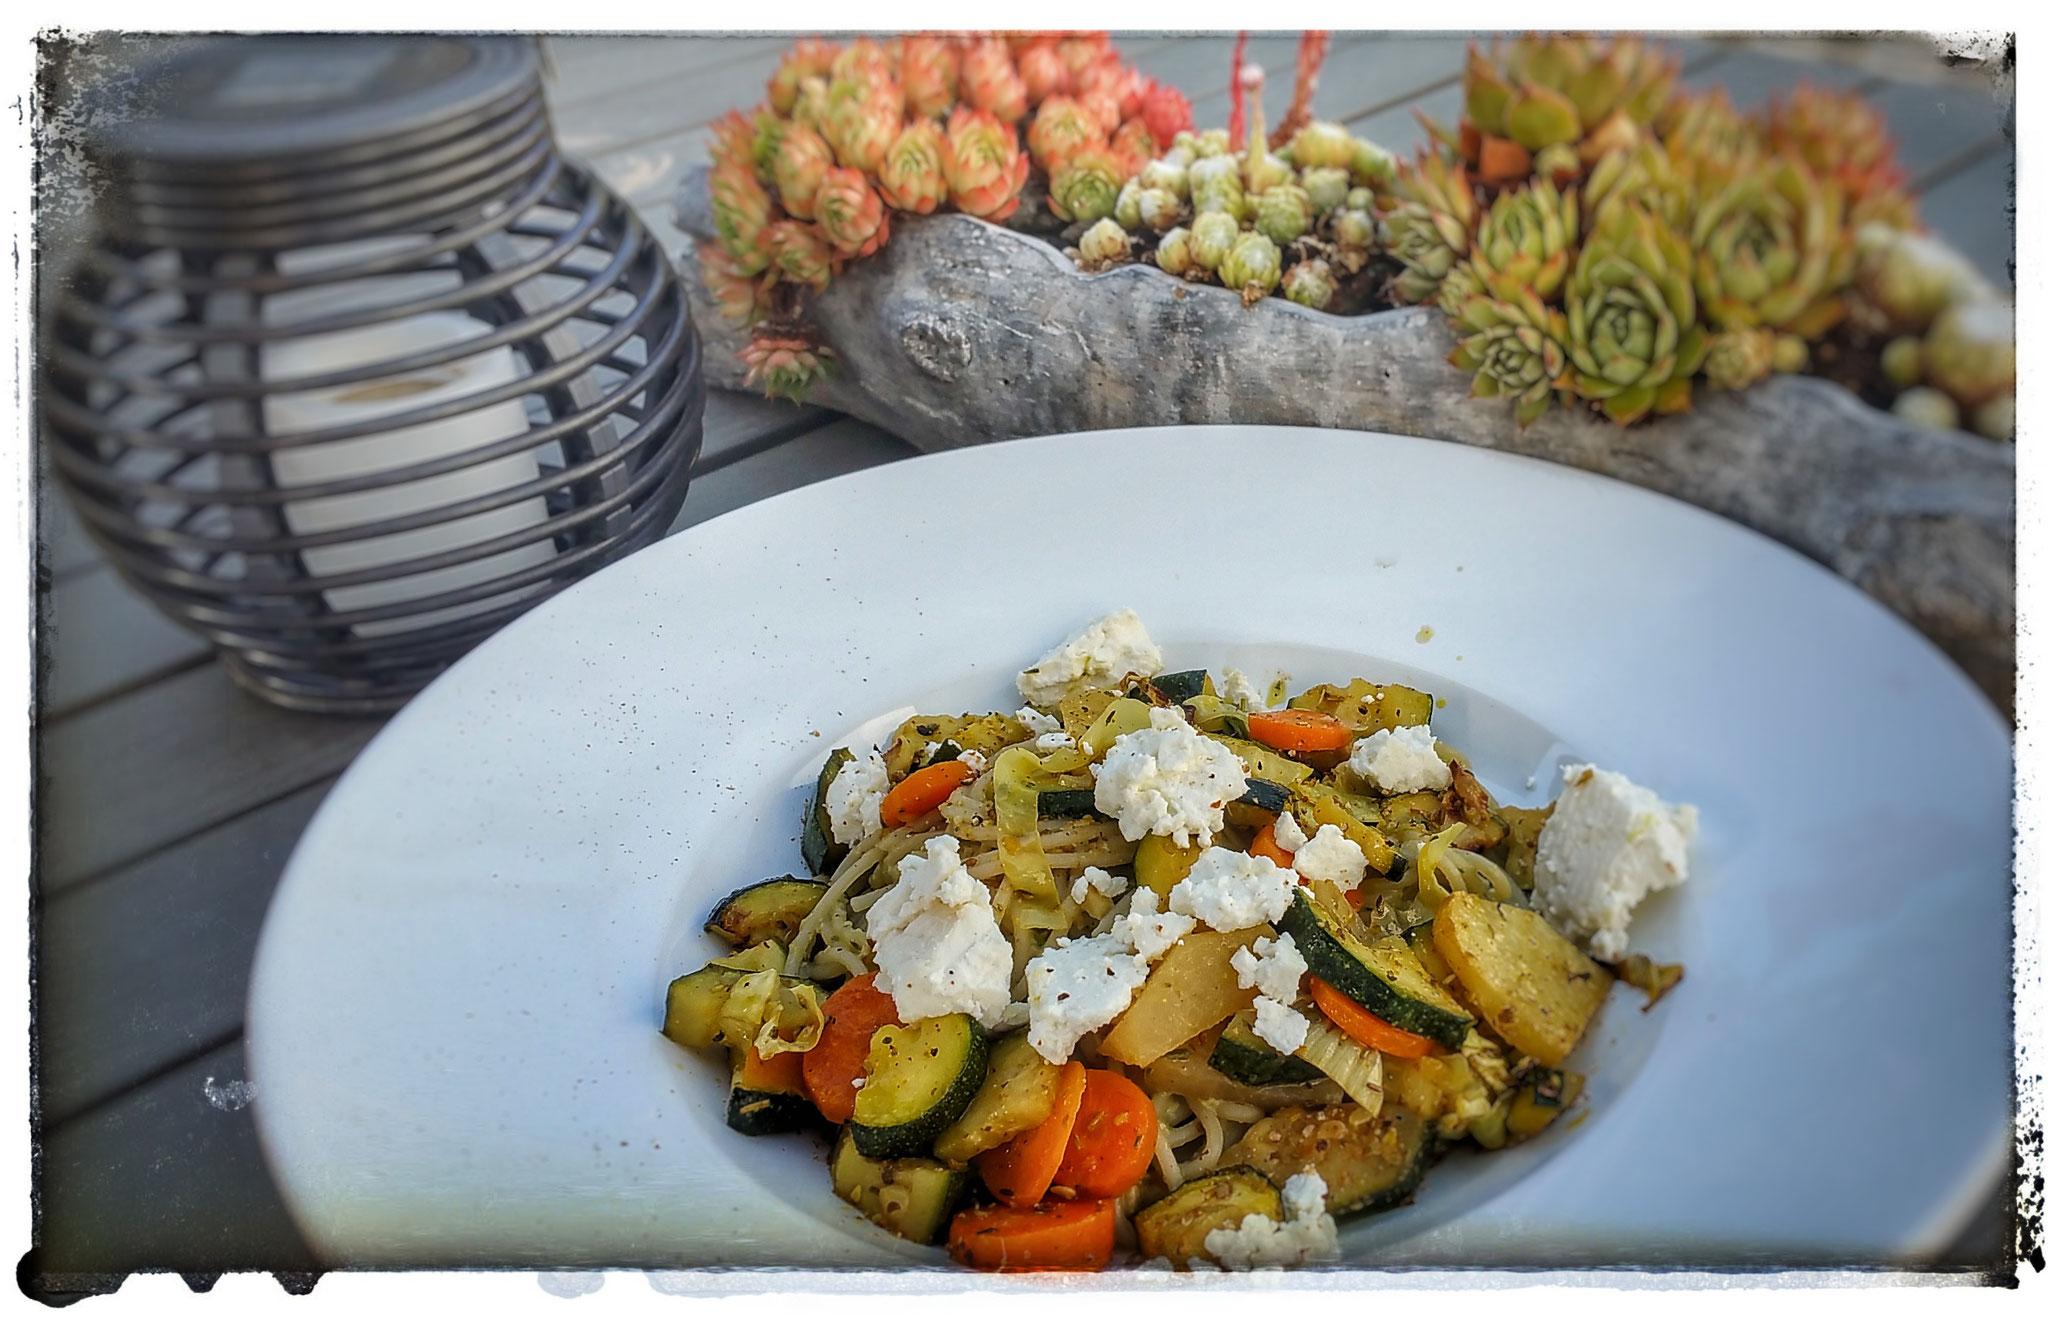 Spaghetti, Möhren, Zucchini mit Topping